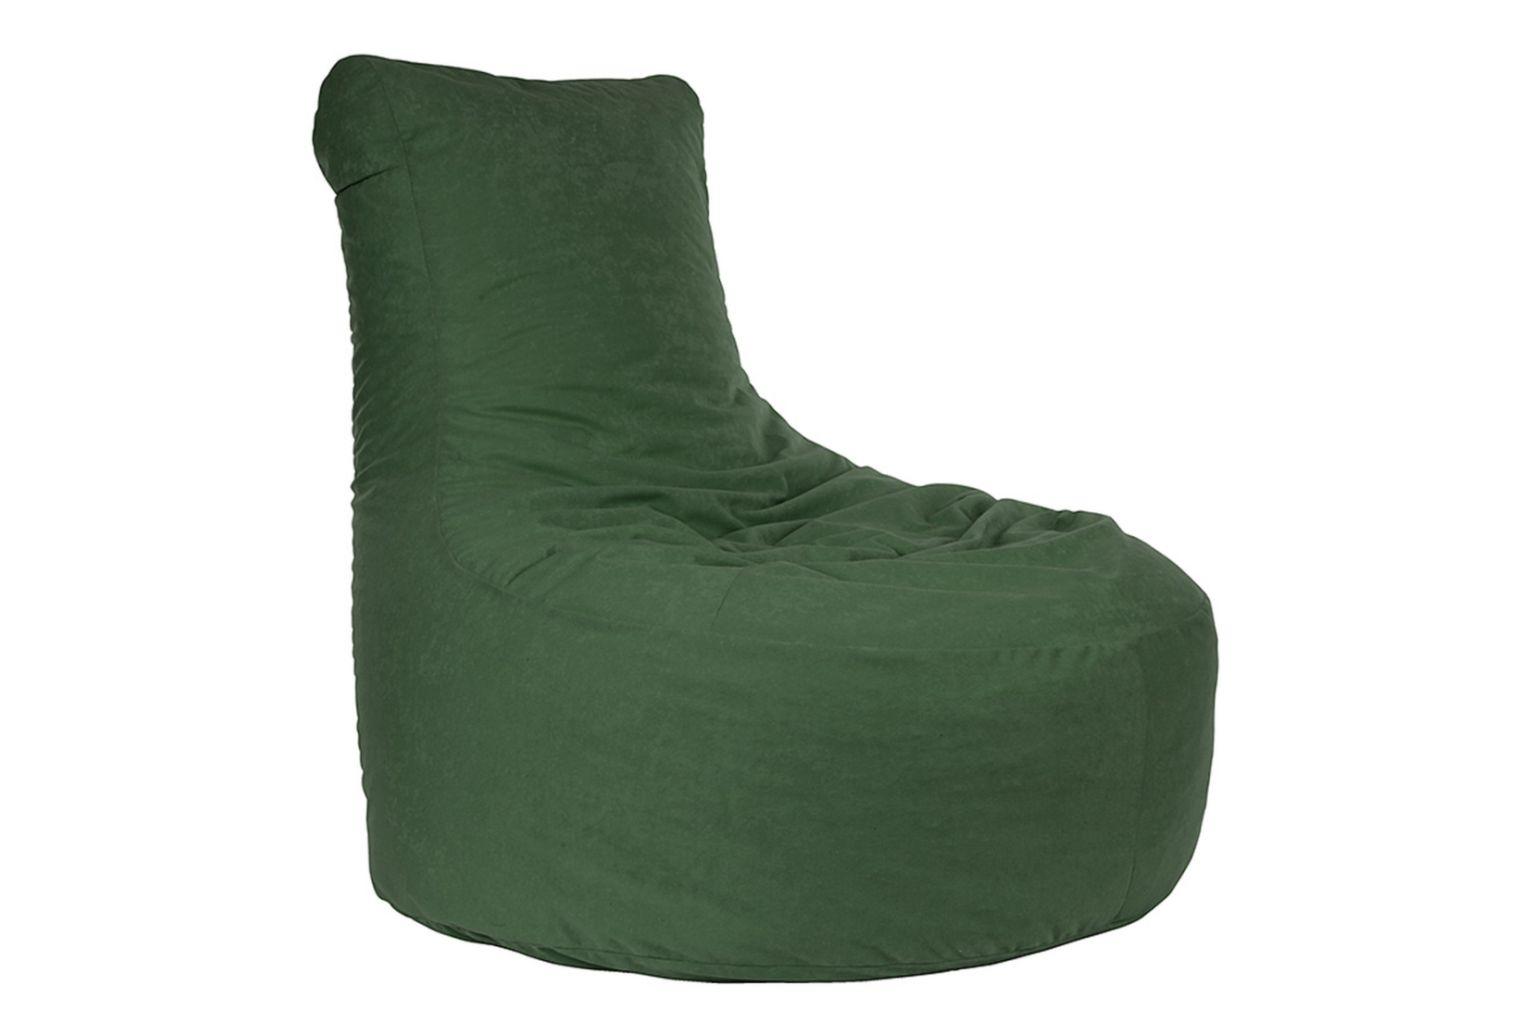 Hogga Sitzsack 509970 moosgrün